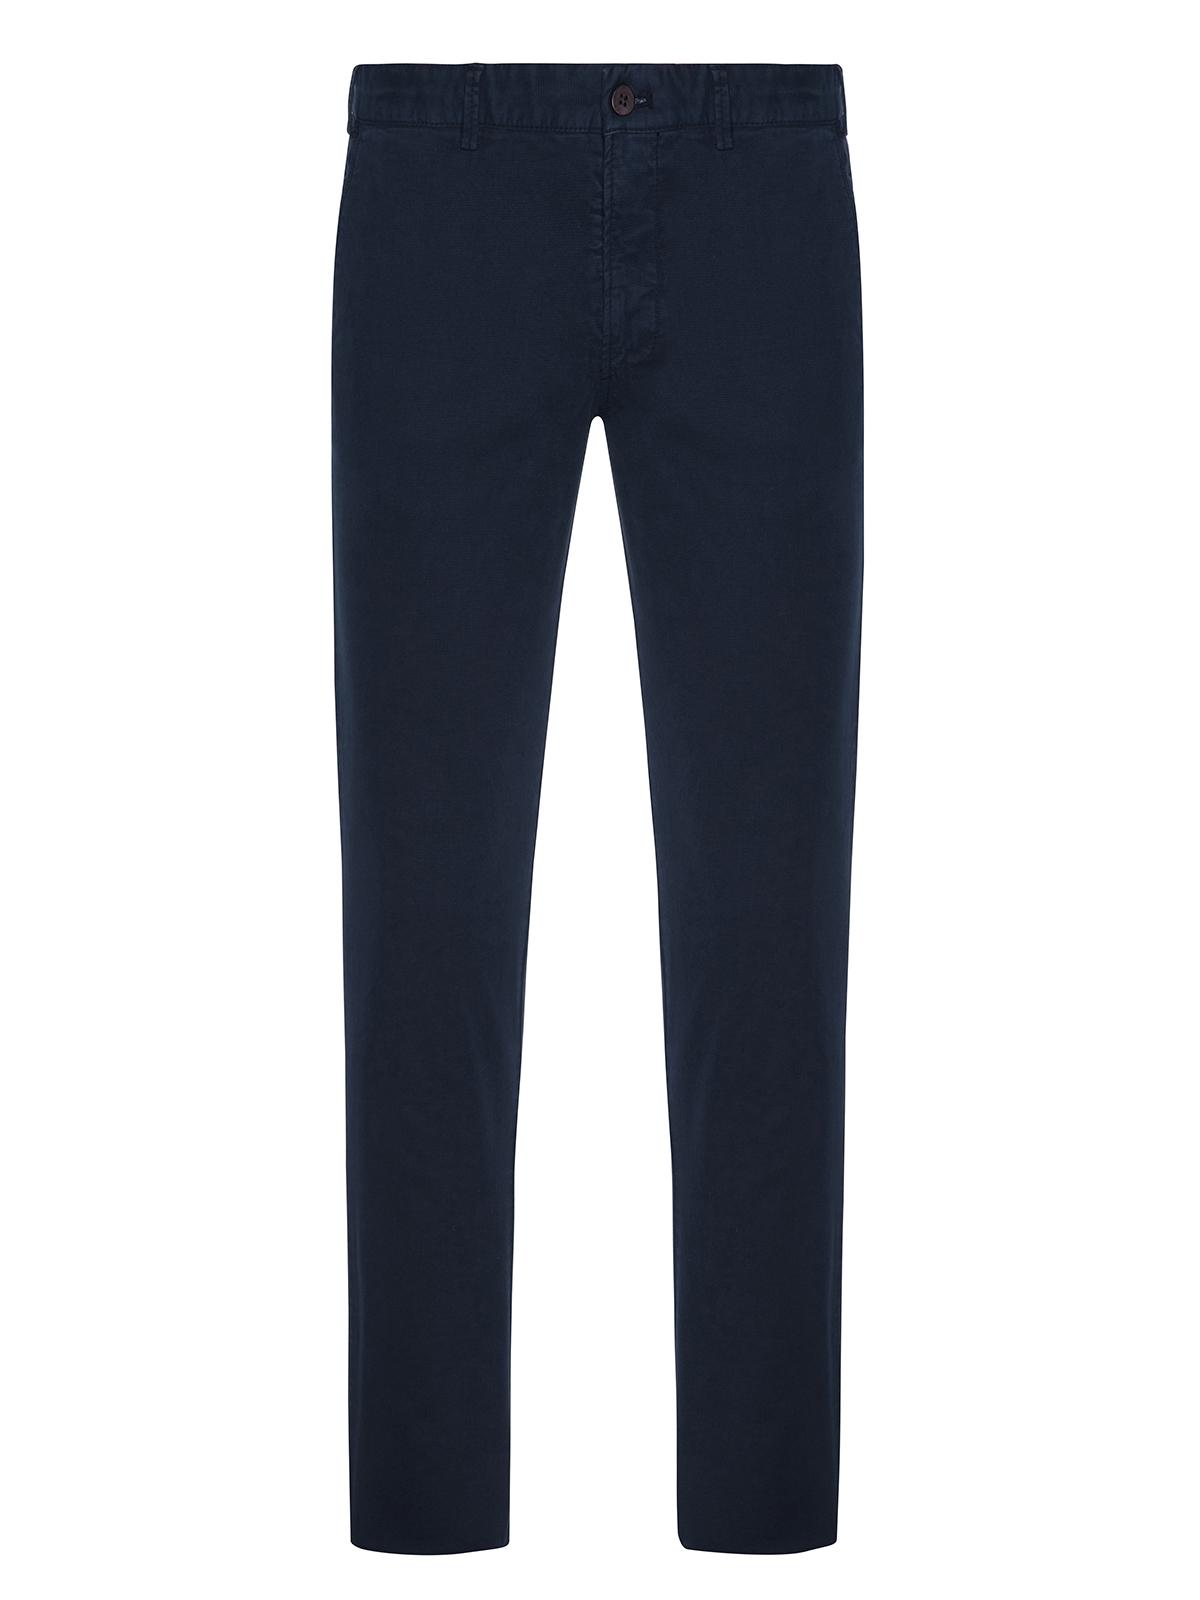 Hiltl - Hiltl Rugged Motion Coton Elastane Lacivert Stertch Tiago Chino Slim Fit Pantolon